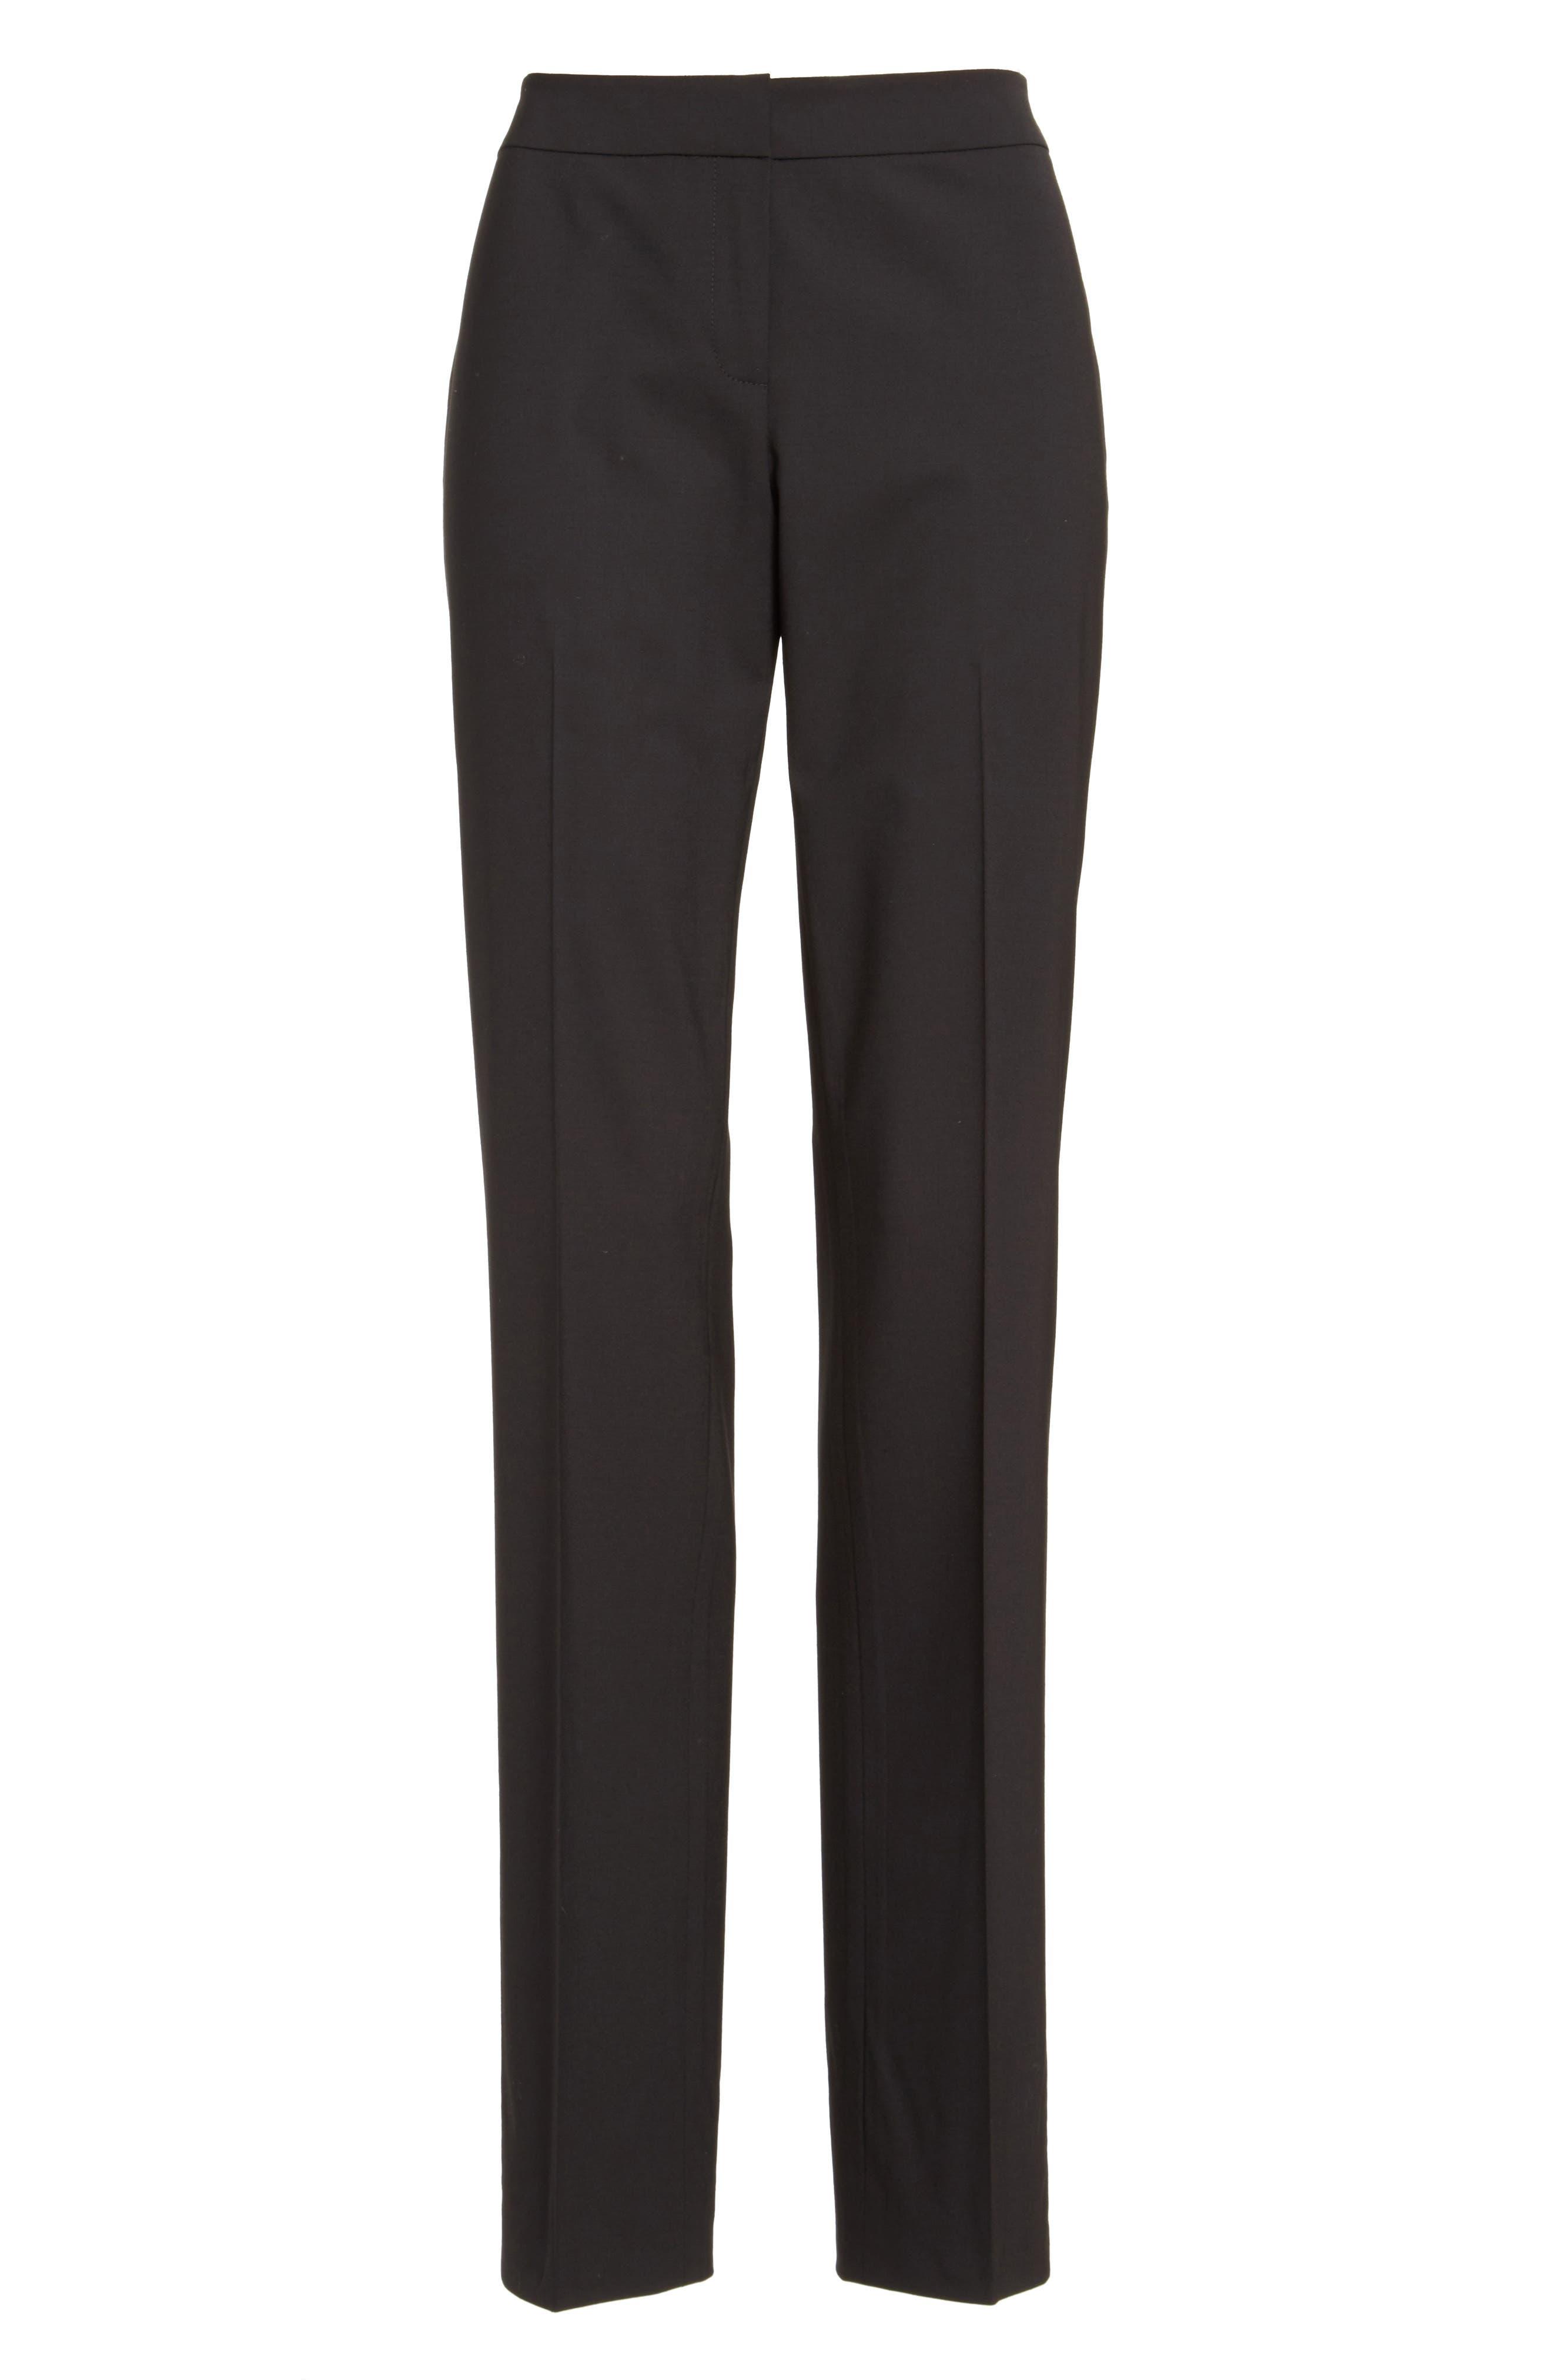 Barrow Stretch Wool Pants,                             Alternate thumbnail 6, color,                             BLACK